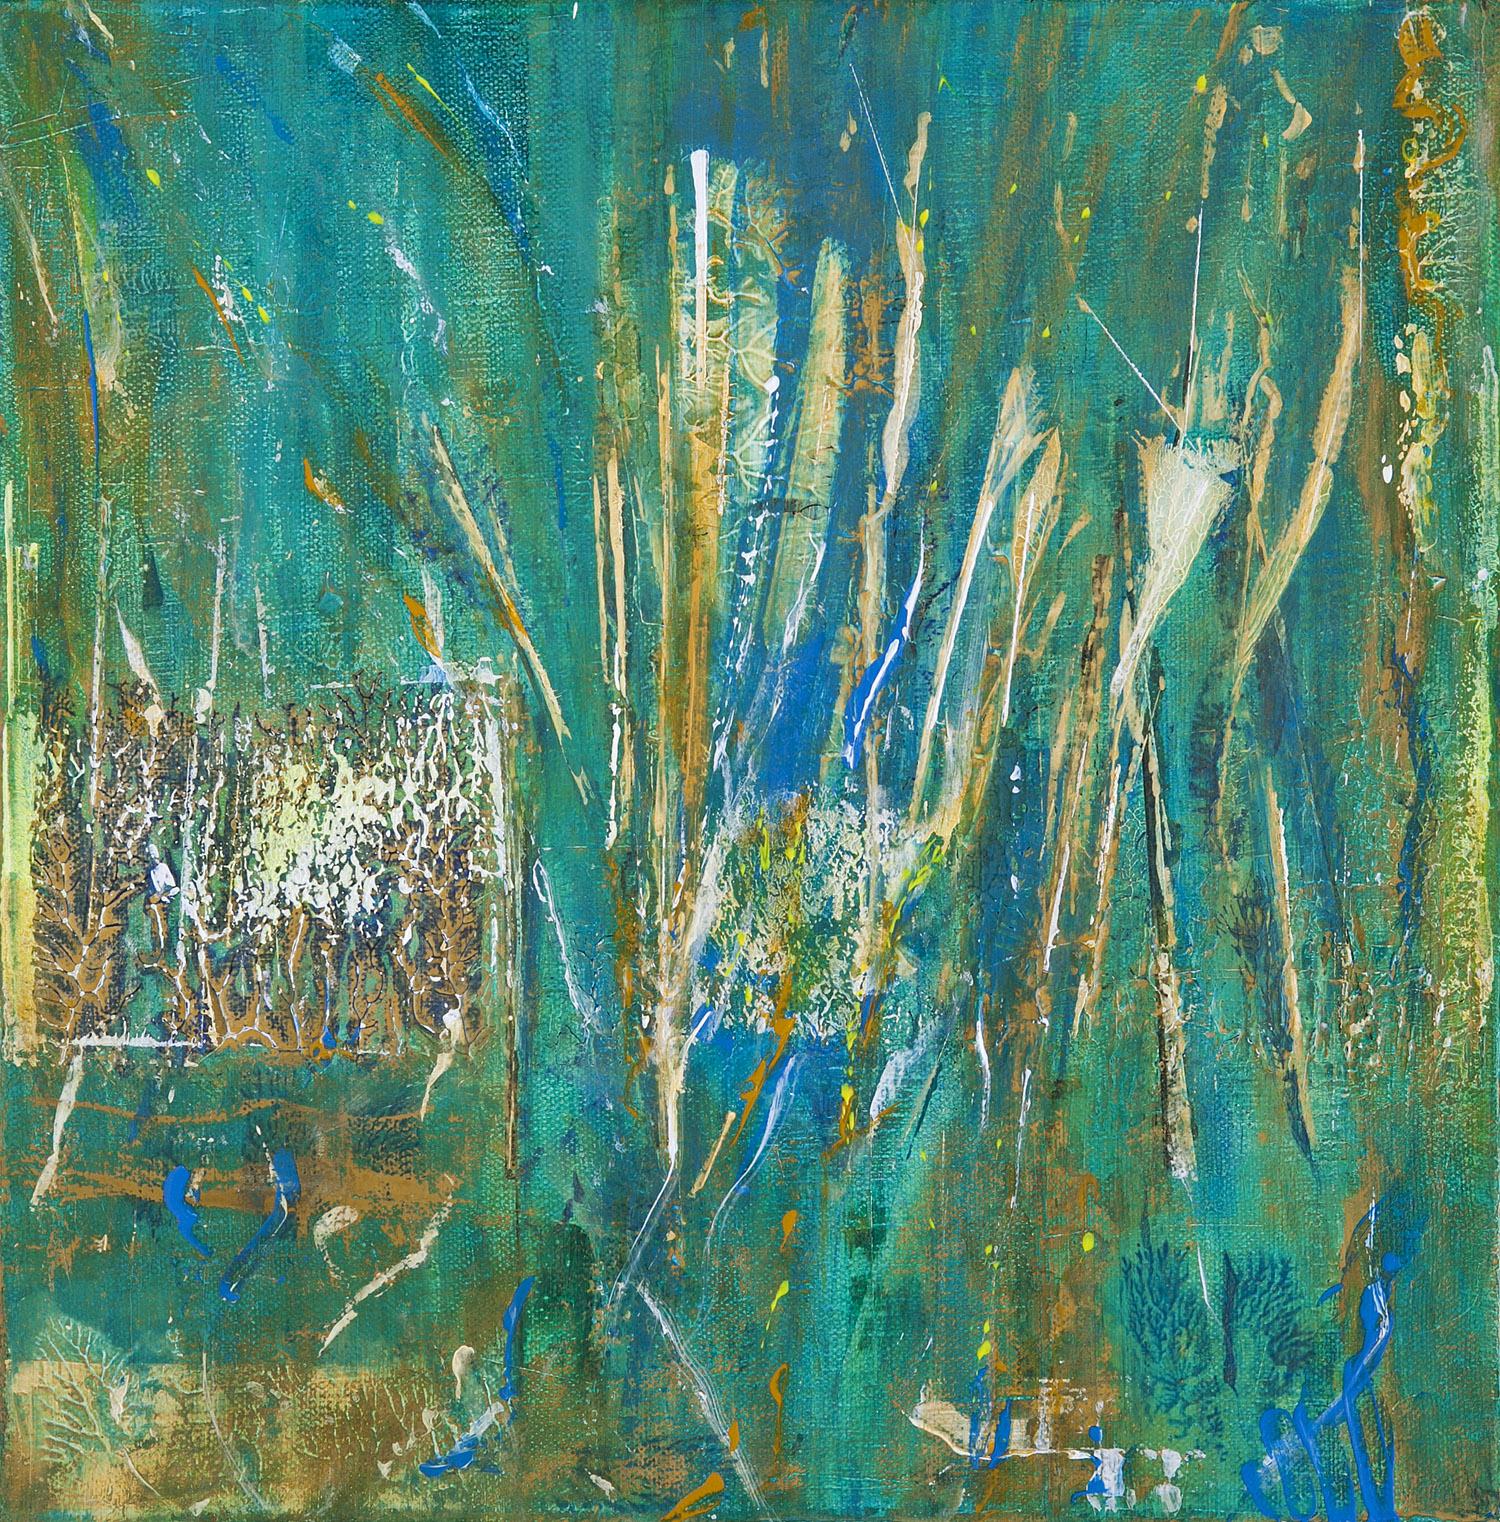 Juncales, acrilico sobre lienzo, 30x30cm, 2014.jpg